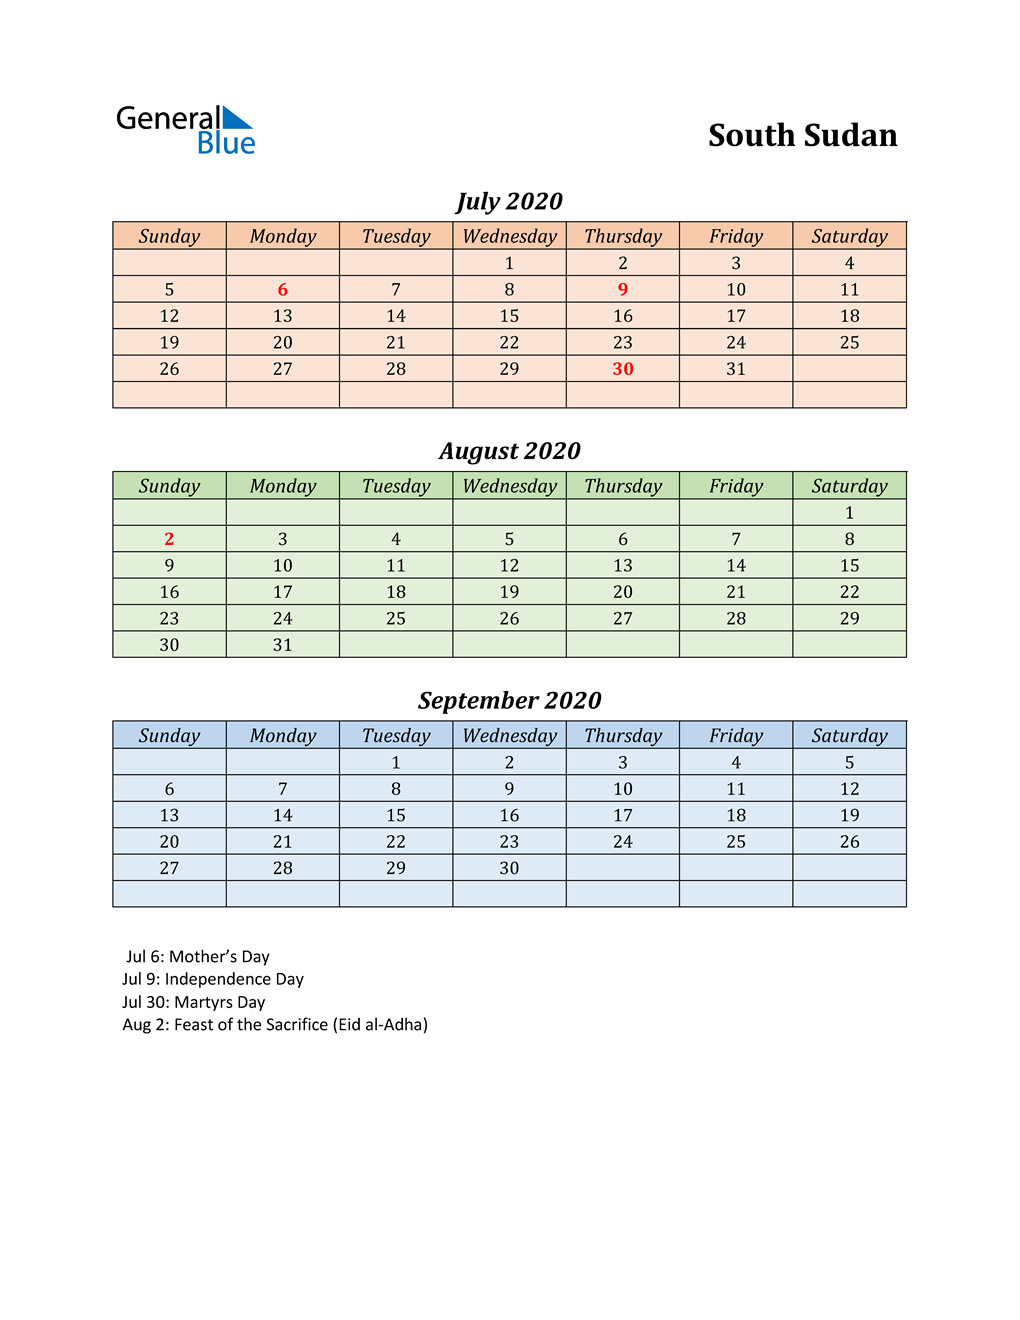 Q3 2020 Holiday Calendar - South Sudan